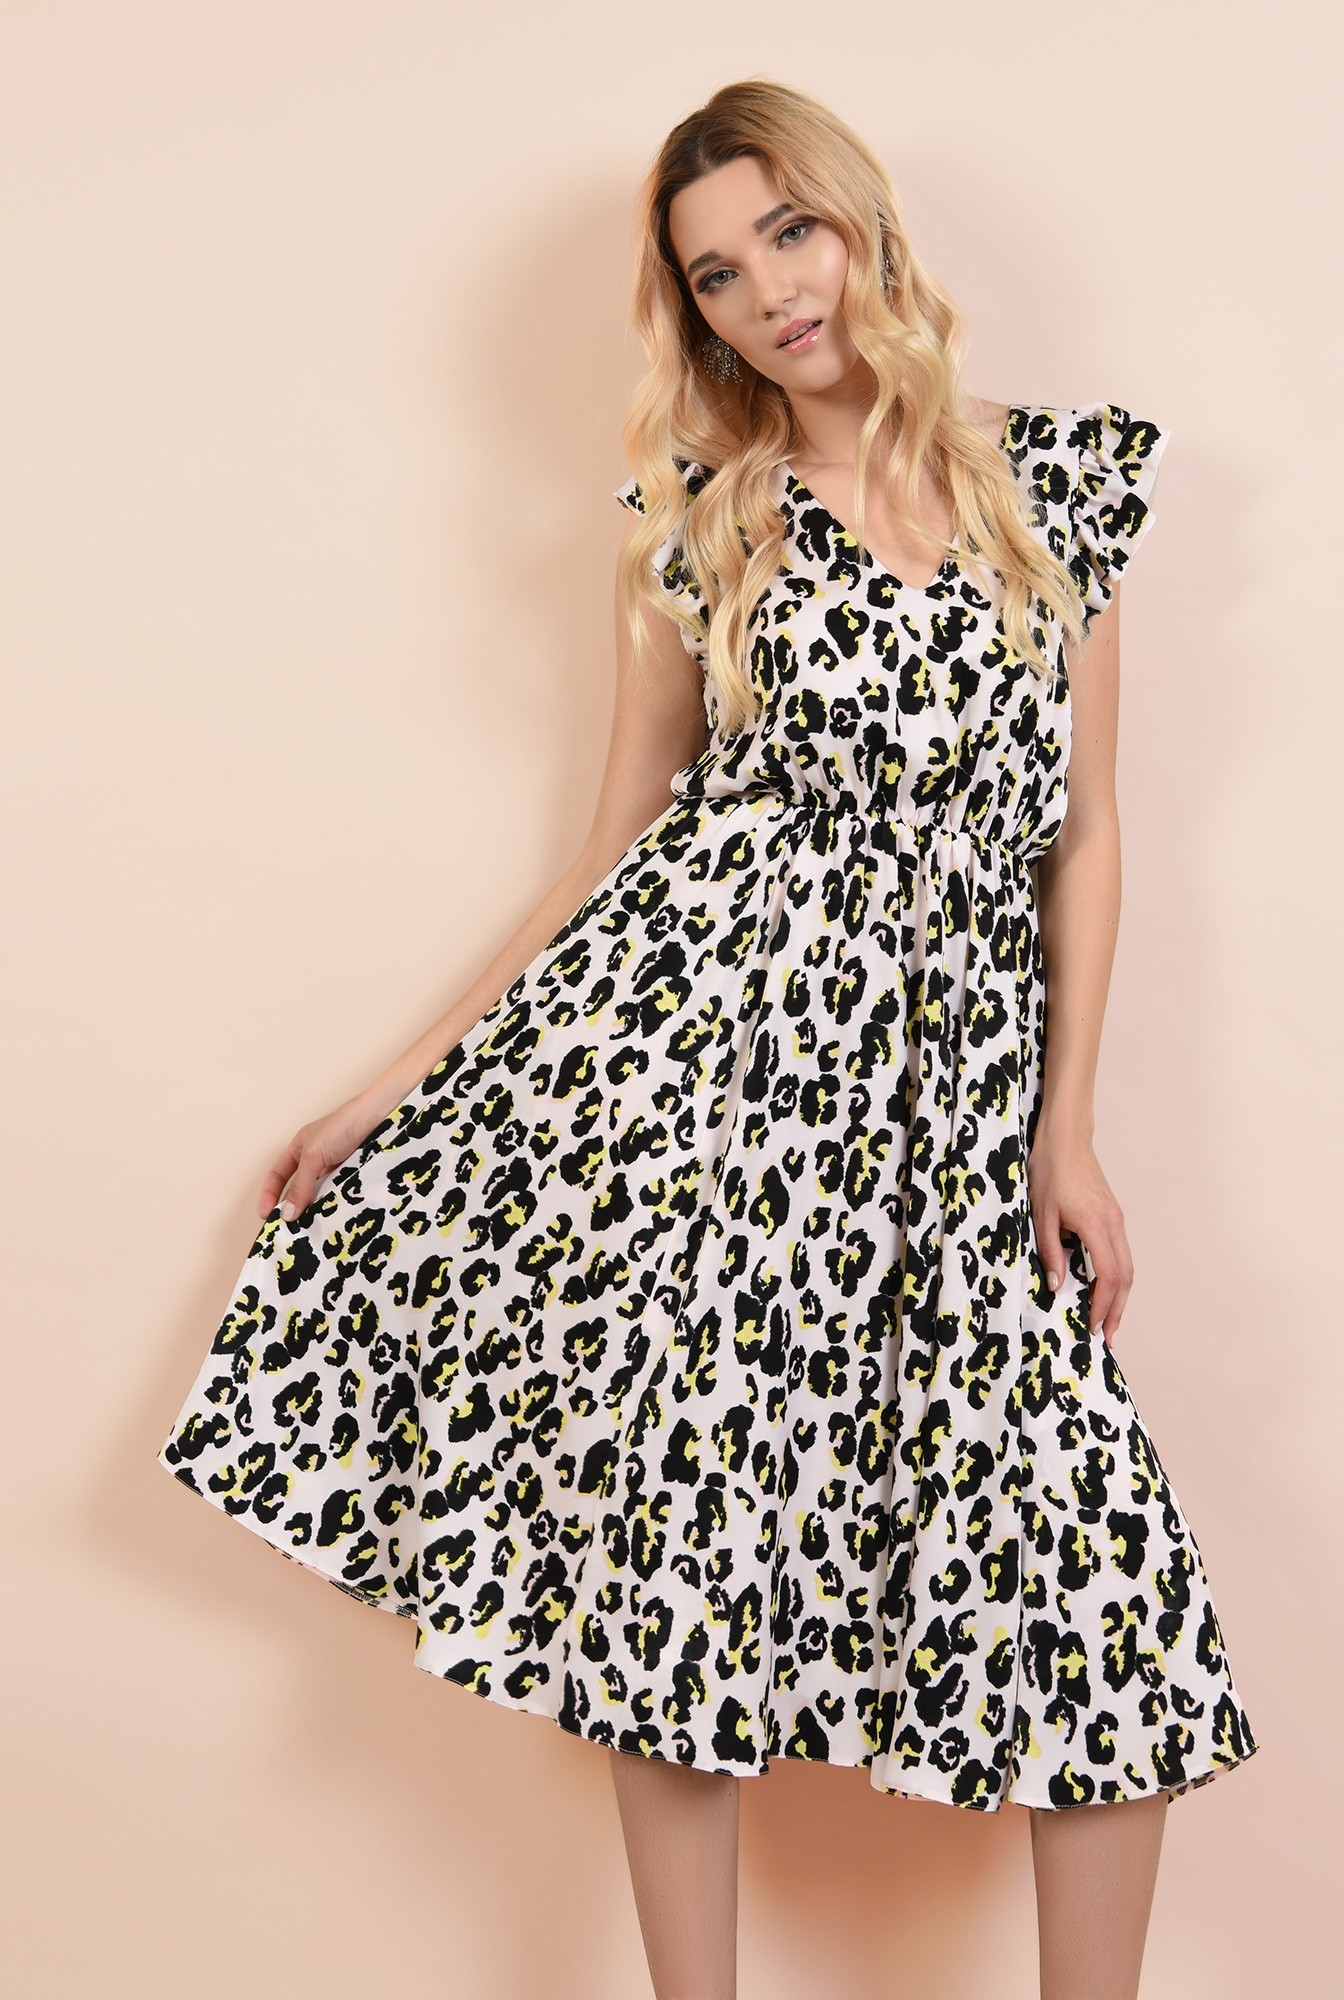 rochie eleganta, cu motive, talie pe elastic, spate decoltat, volane